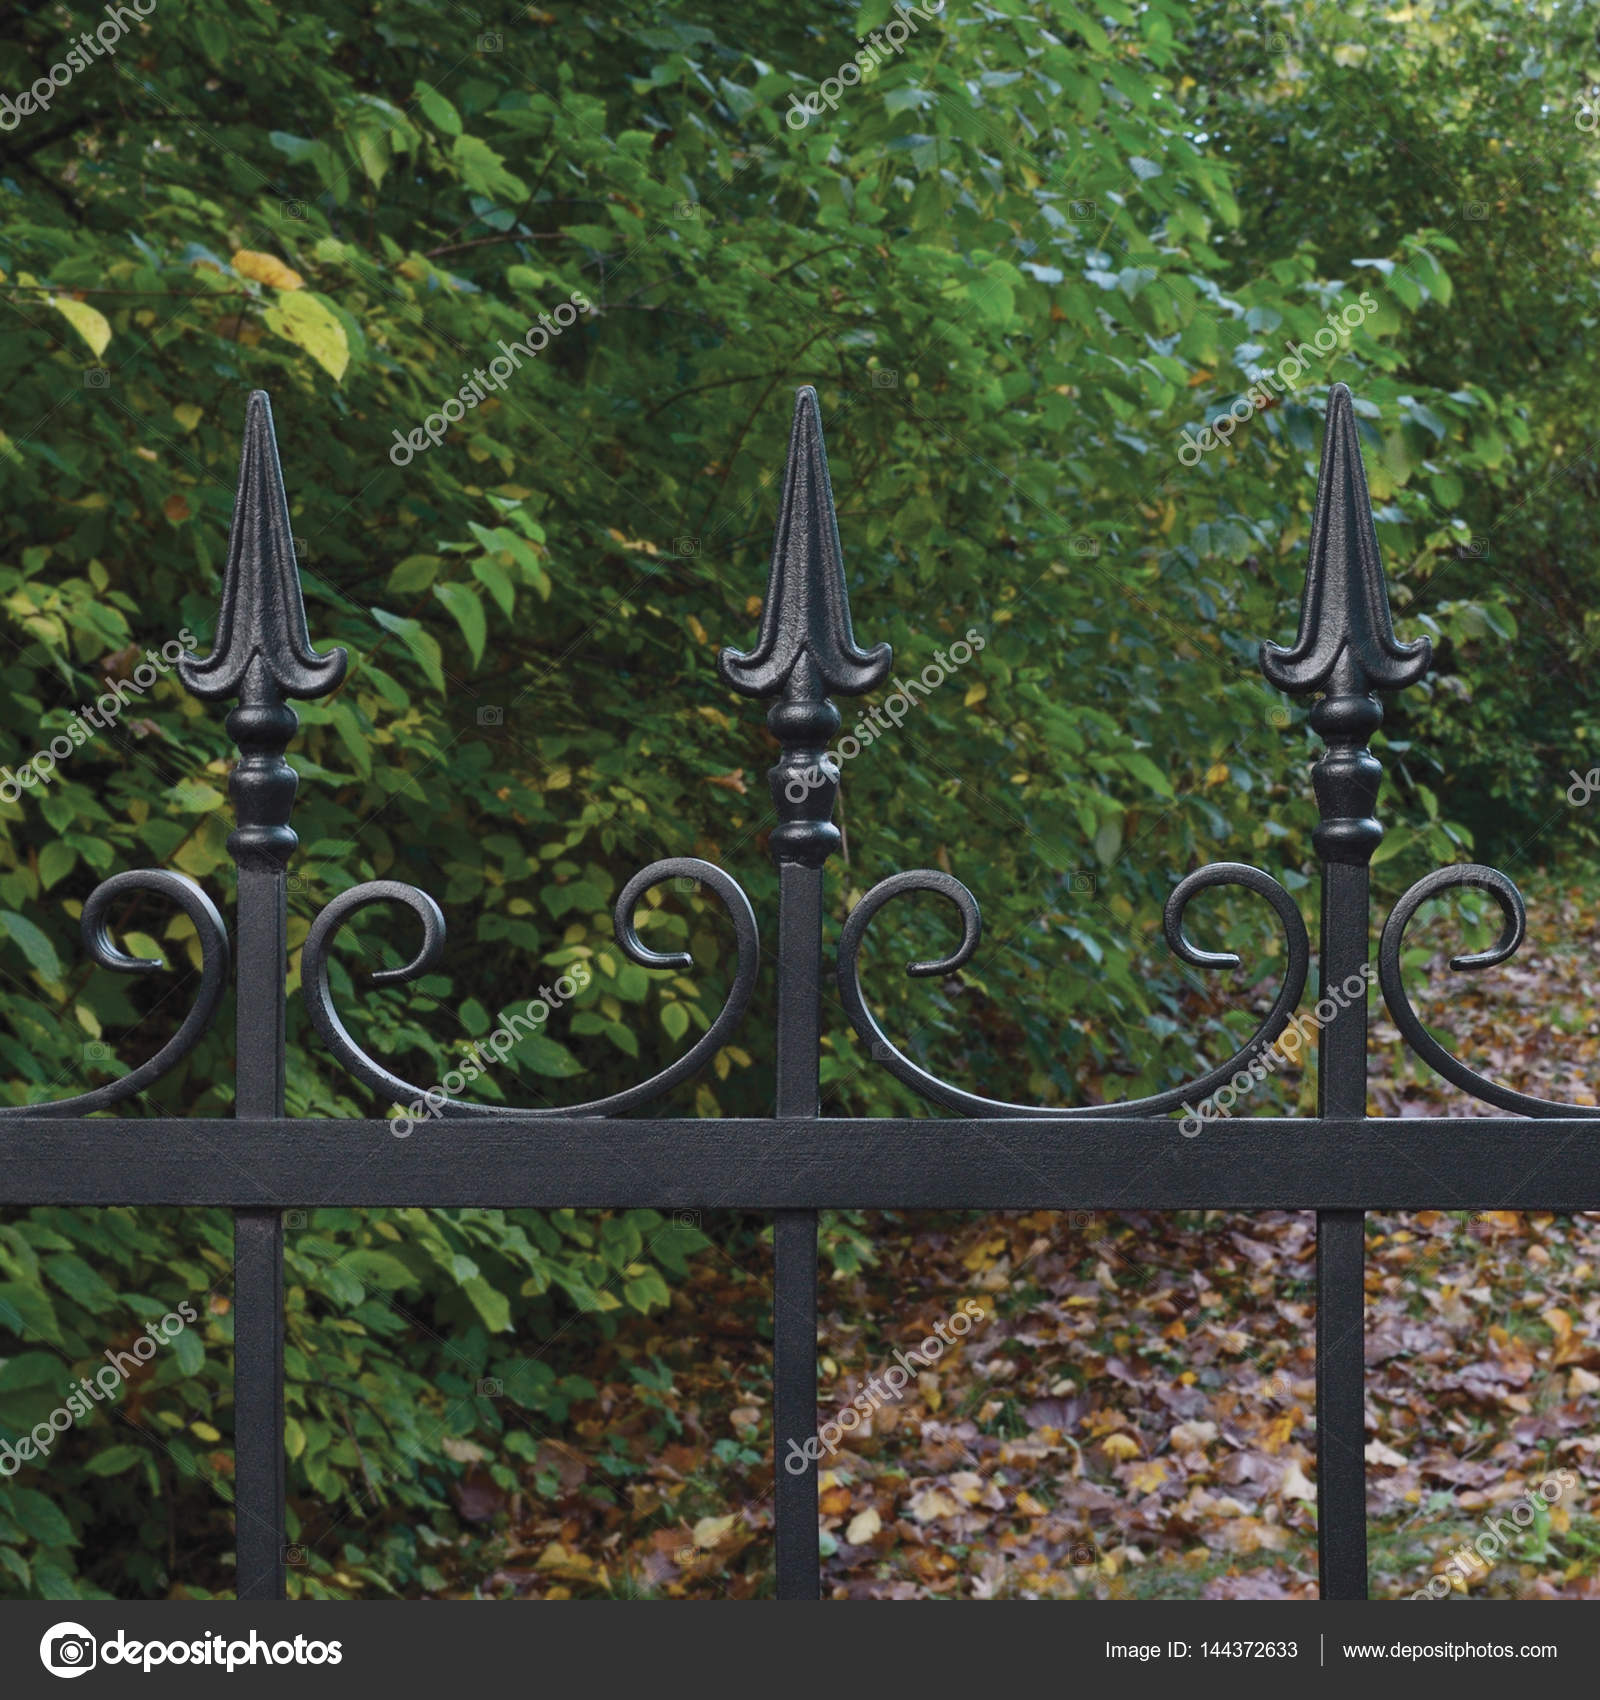 schwarz dekorative Schmiedeeisen Zaun Closeup herbstliche Bäume